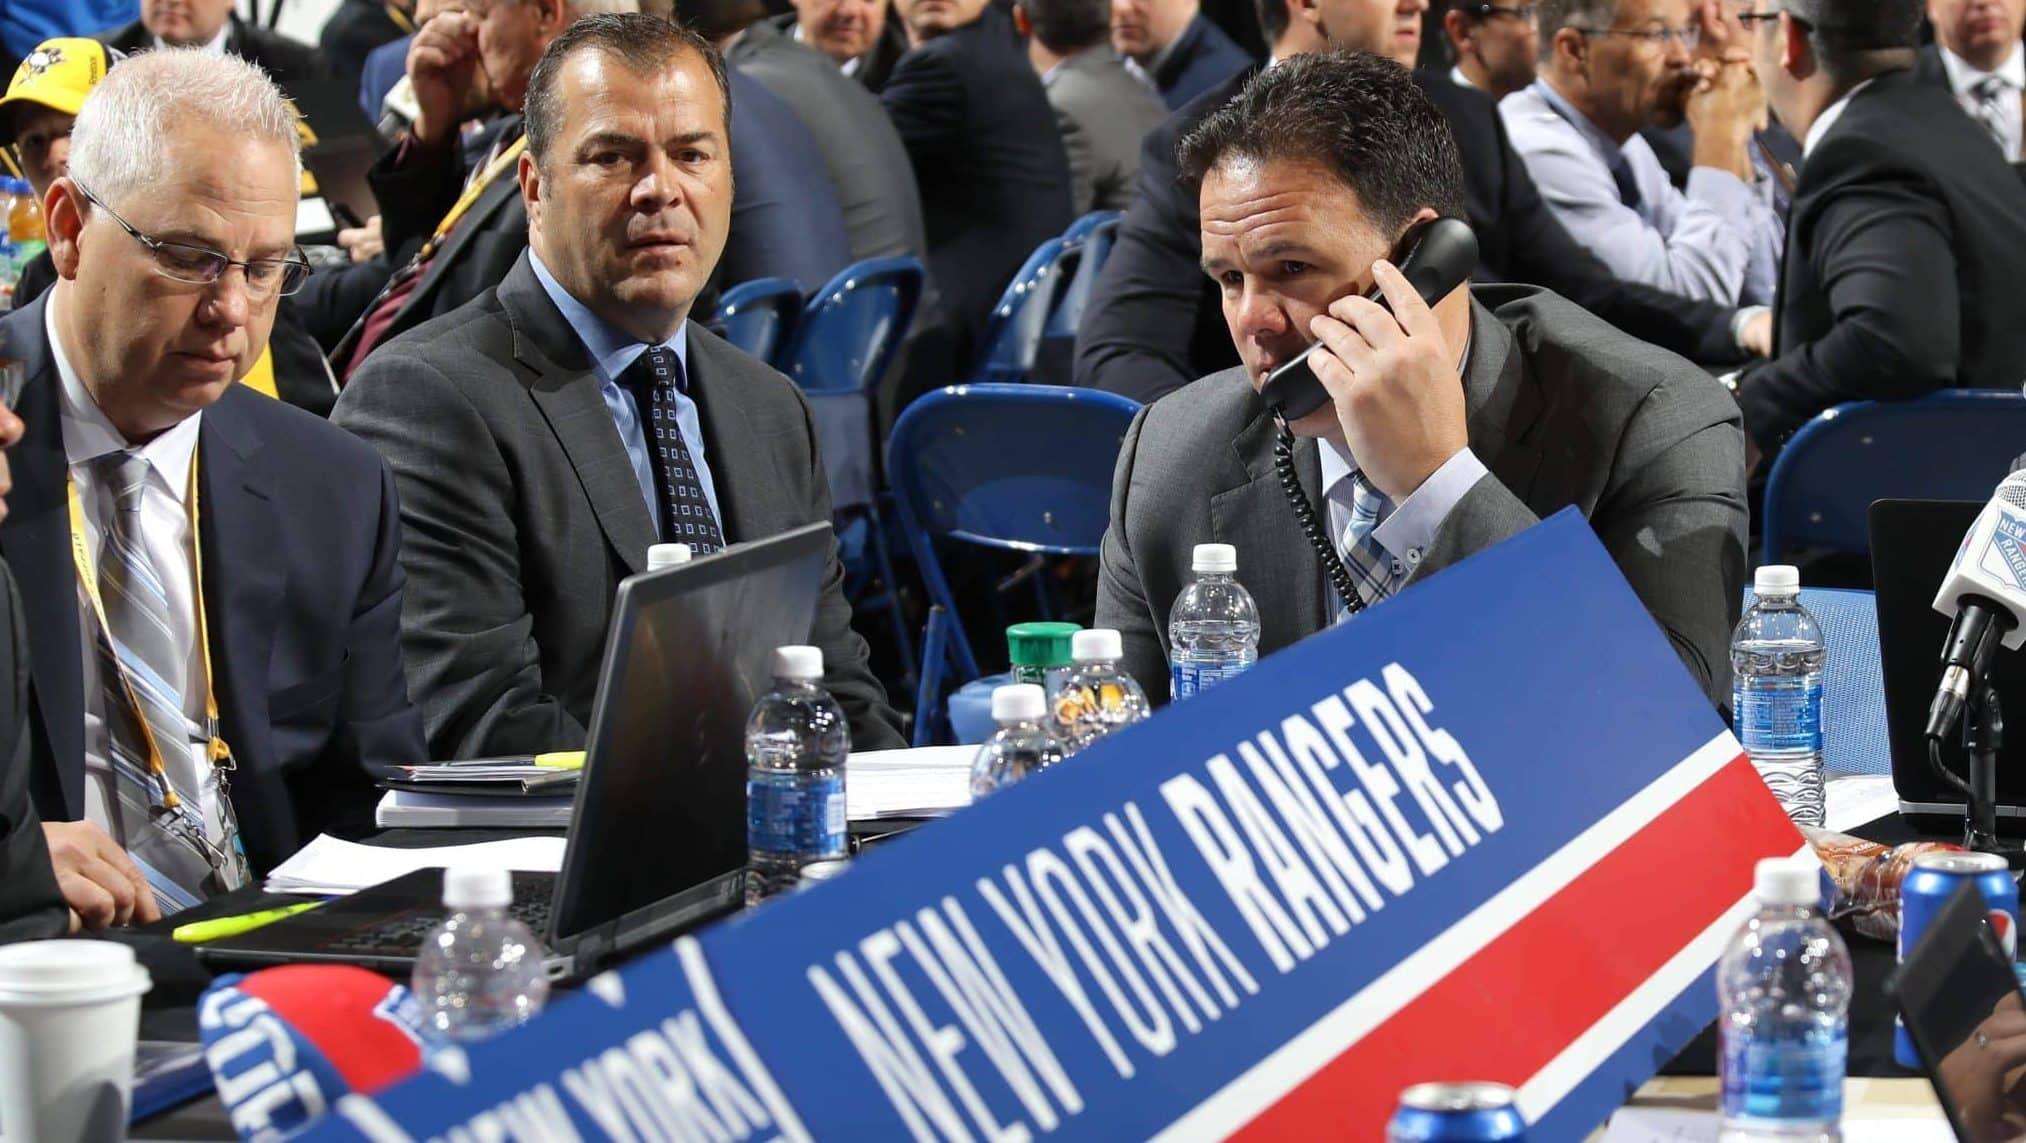 Jeff Gorton, New York Rangers